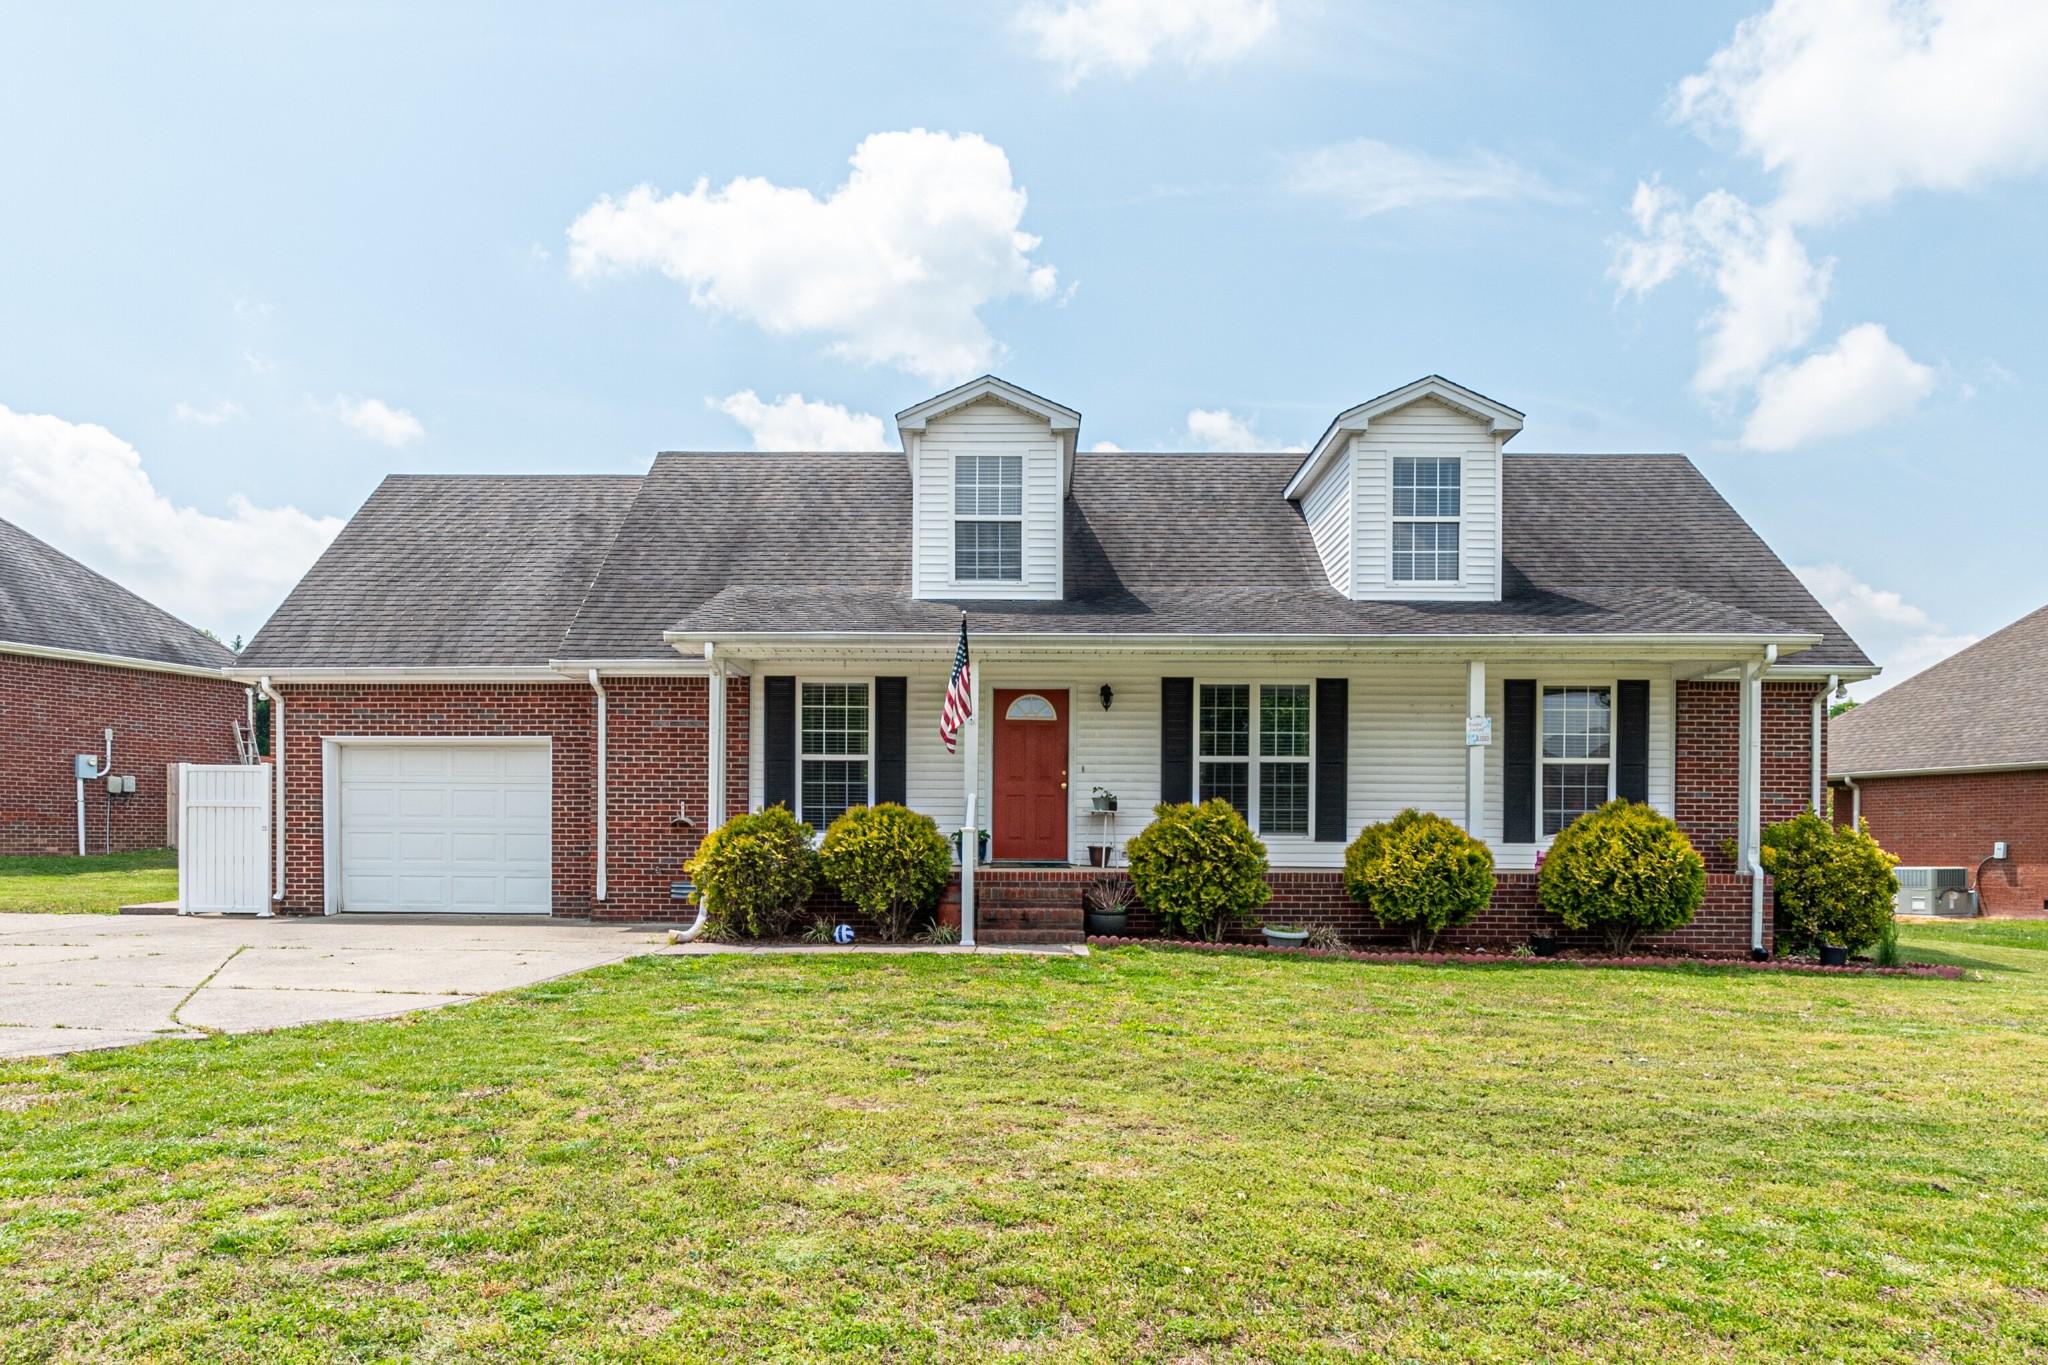 444 Robins Trl Property Photo - Westmoreland, TN real estate listing